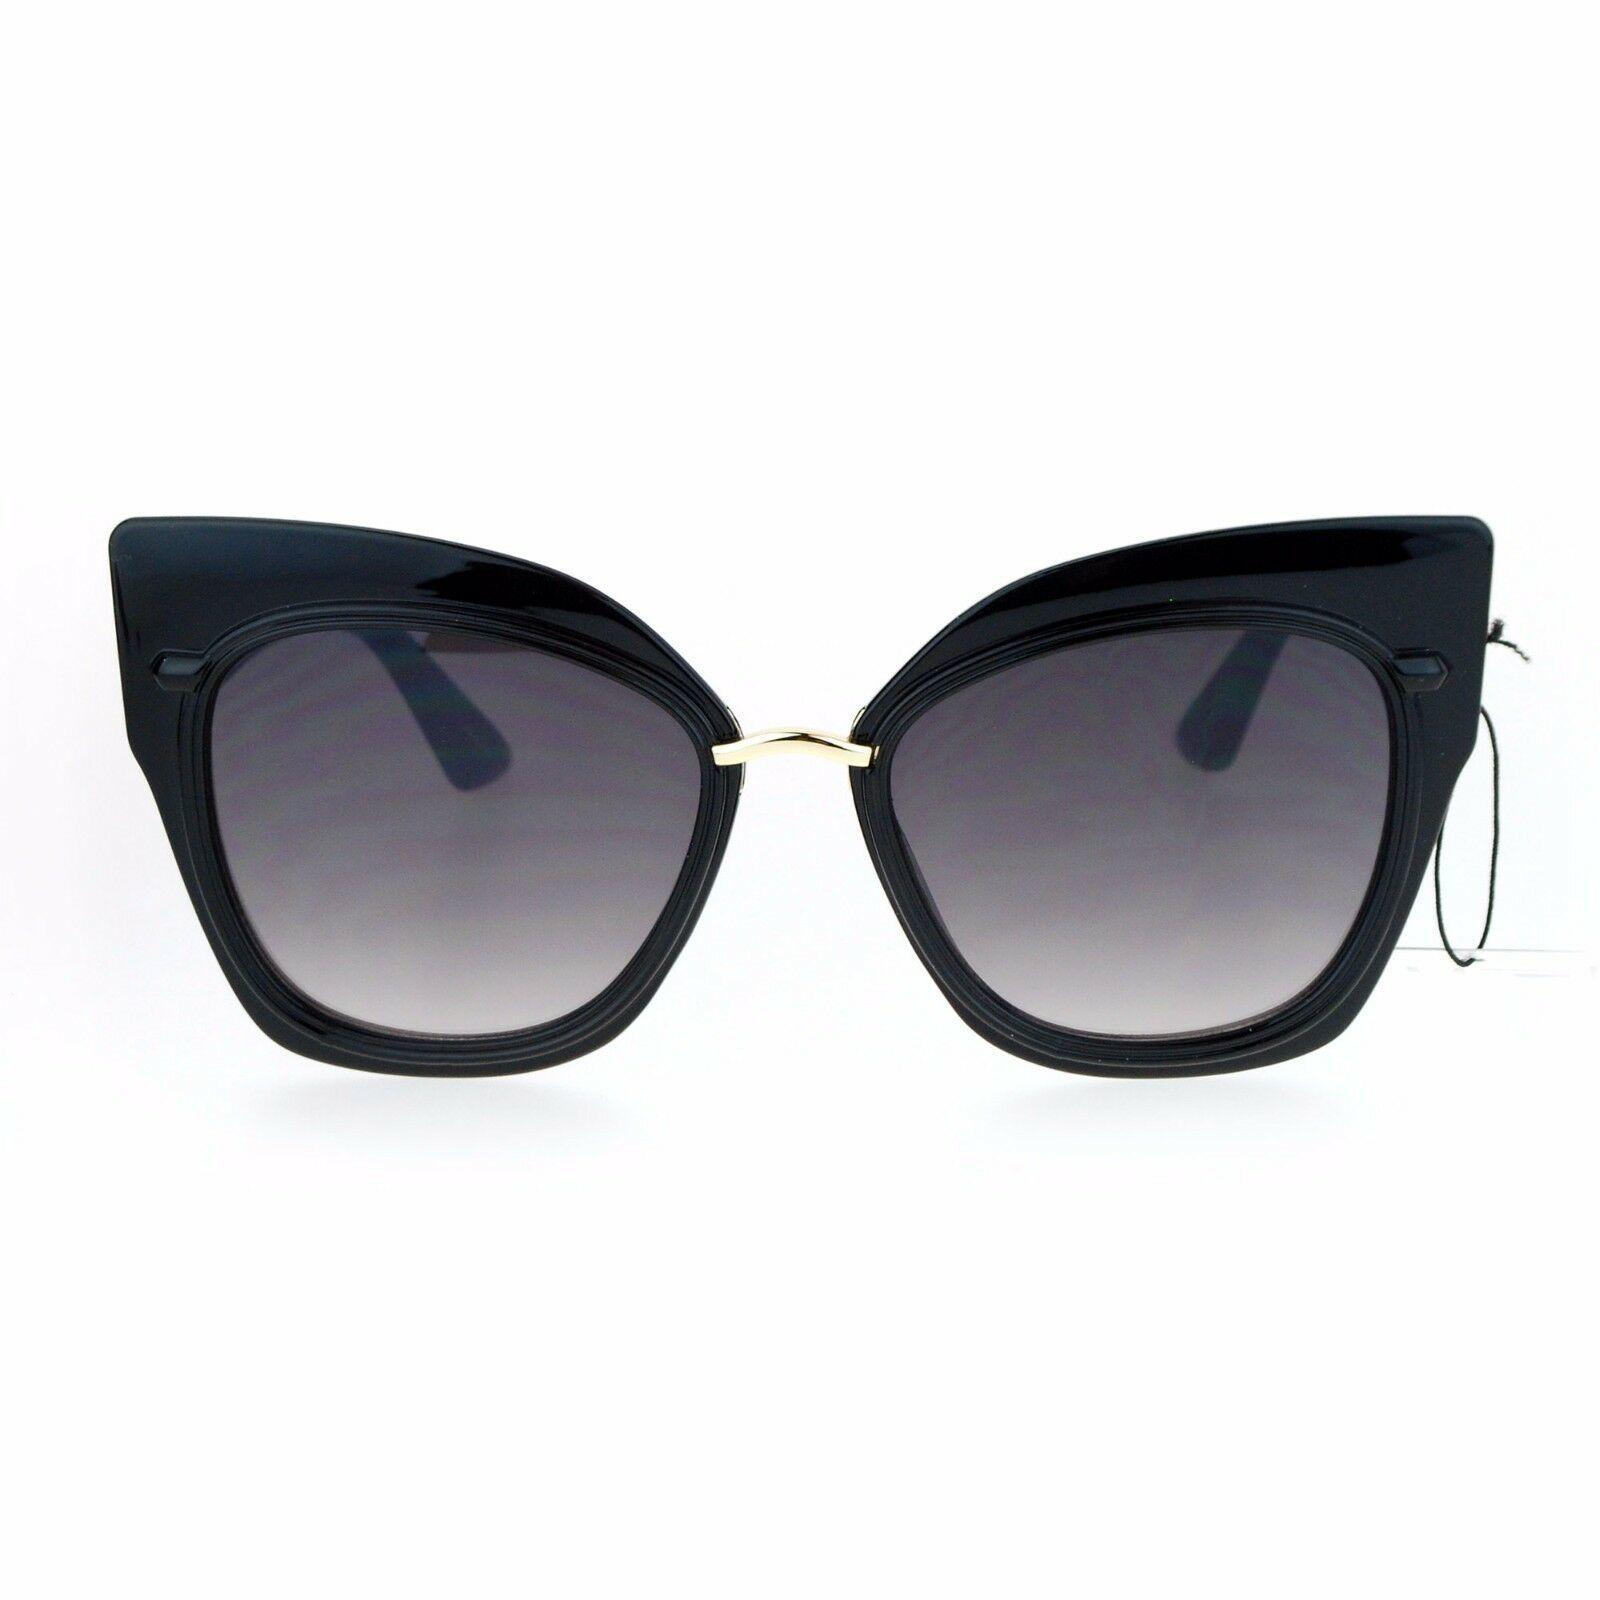 Oversized Fashion Sunglasses Womens Square Cateye Butterfly UV 400 image 6